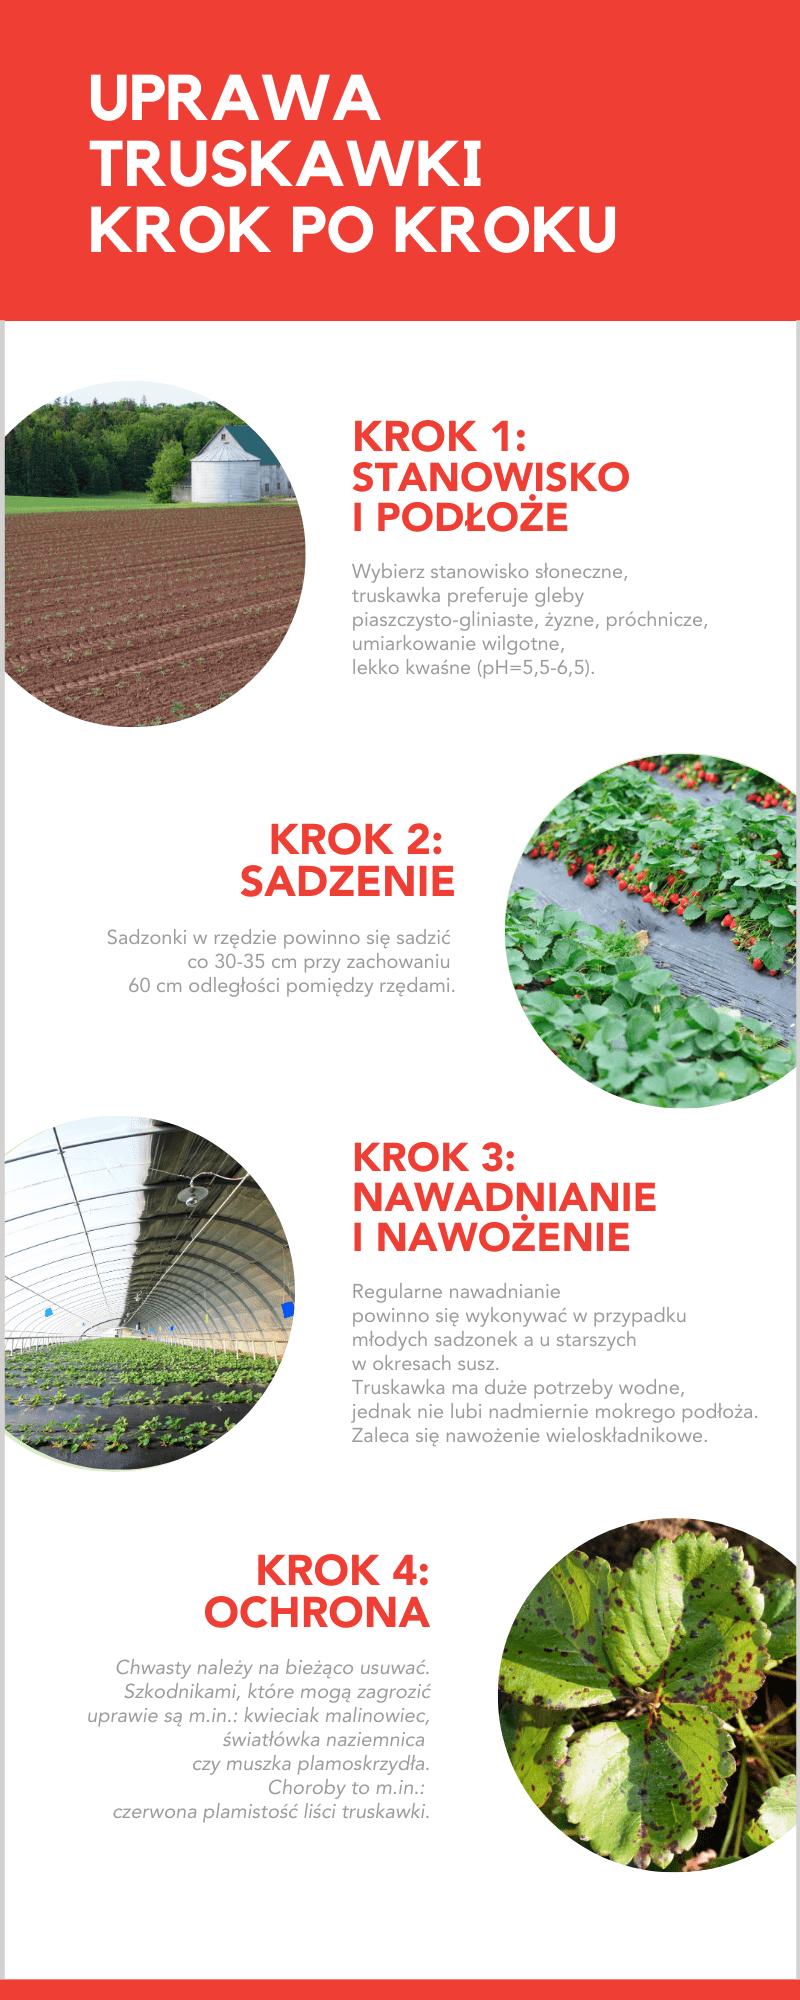 uprawa-truskawki-krok-po-kroku-infografika